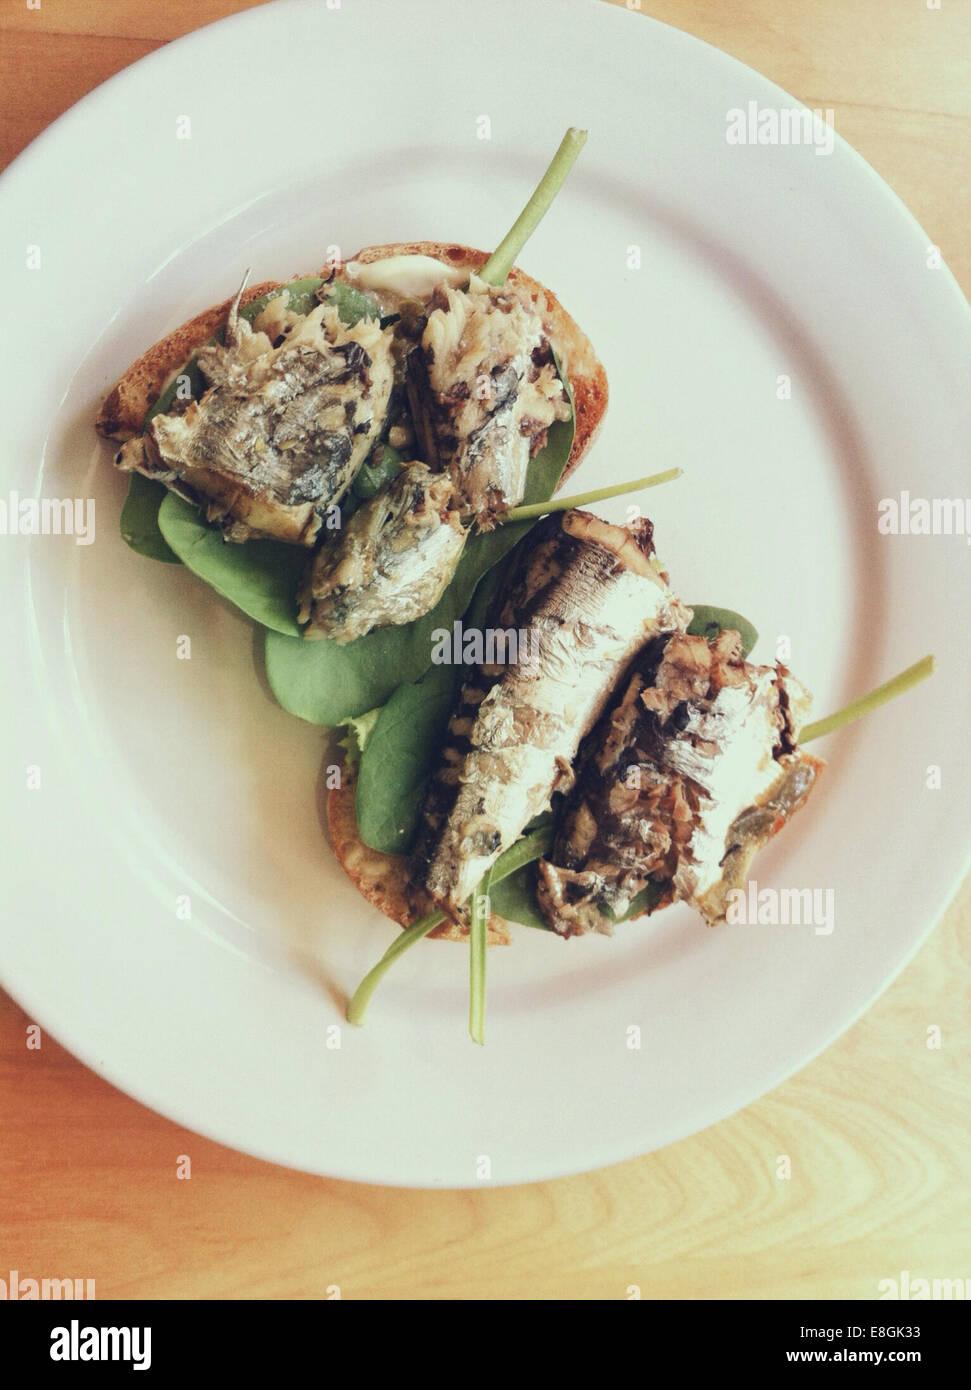 Sardines sur toast avec épinards frais verts Photo Stock